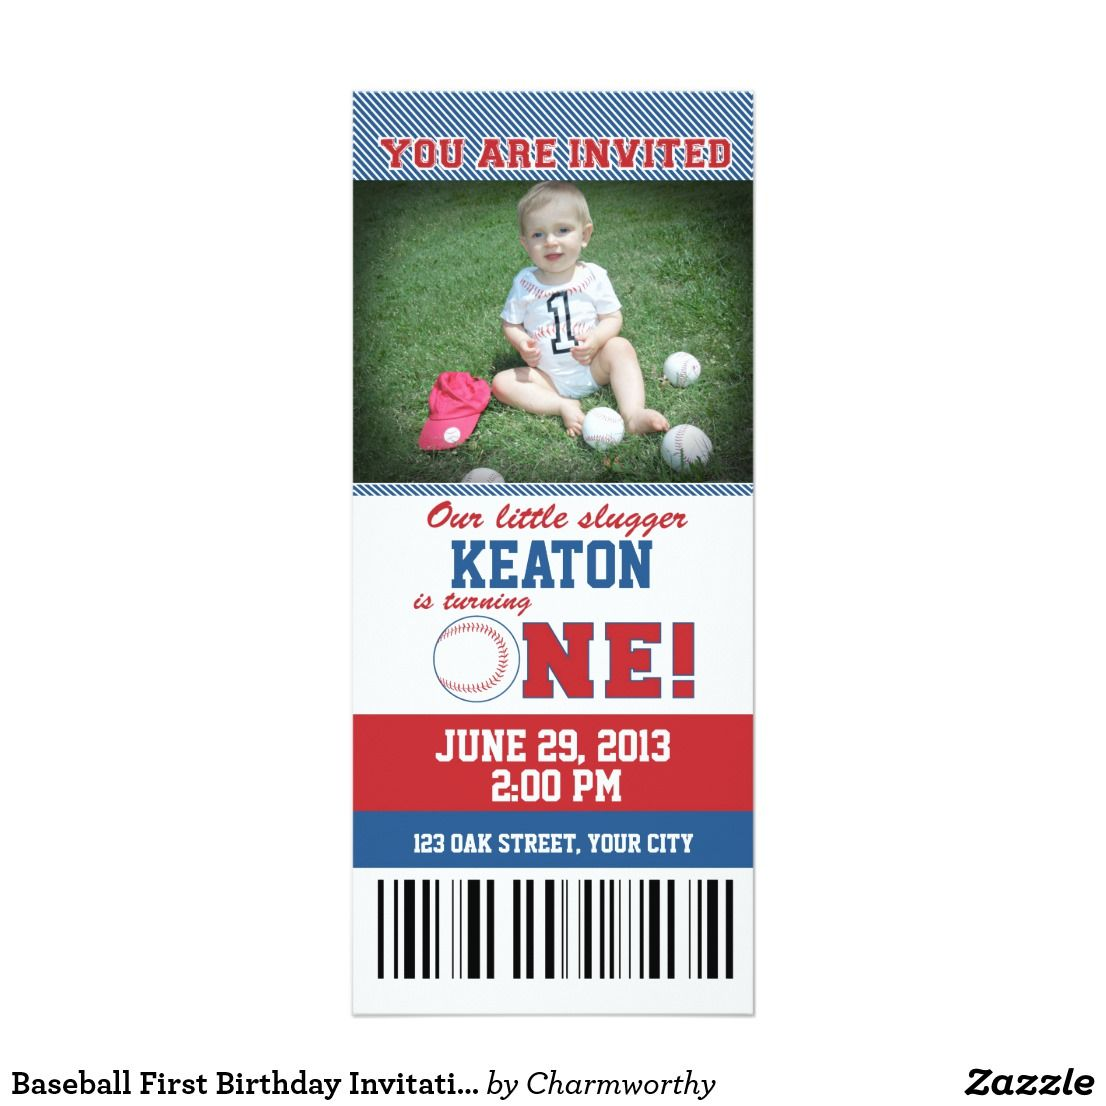 Baseball First Birthday Invitation | Baseball games and Birthdays